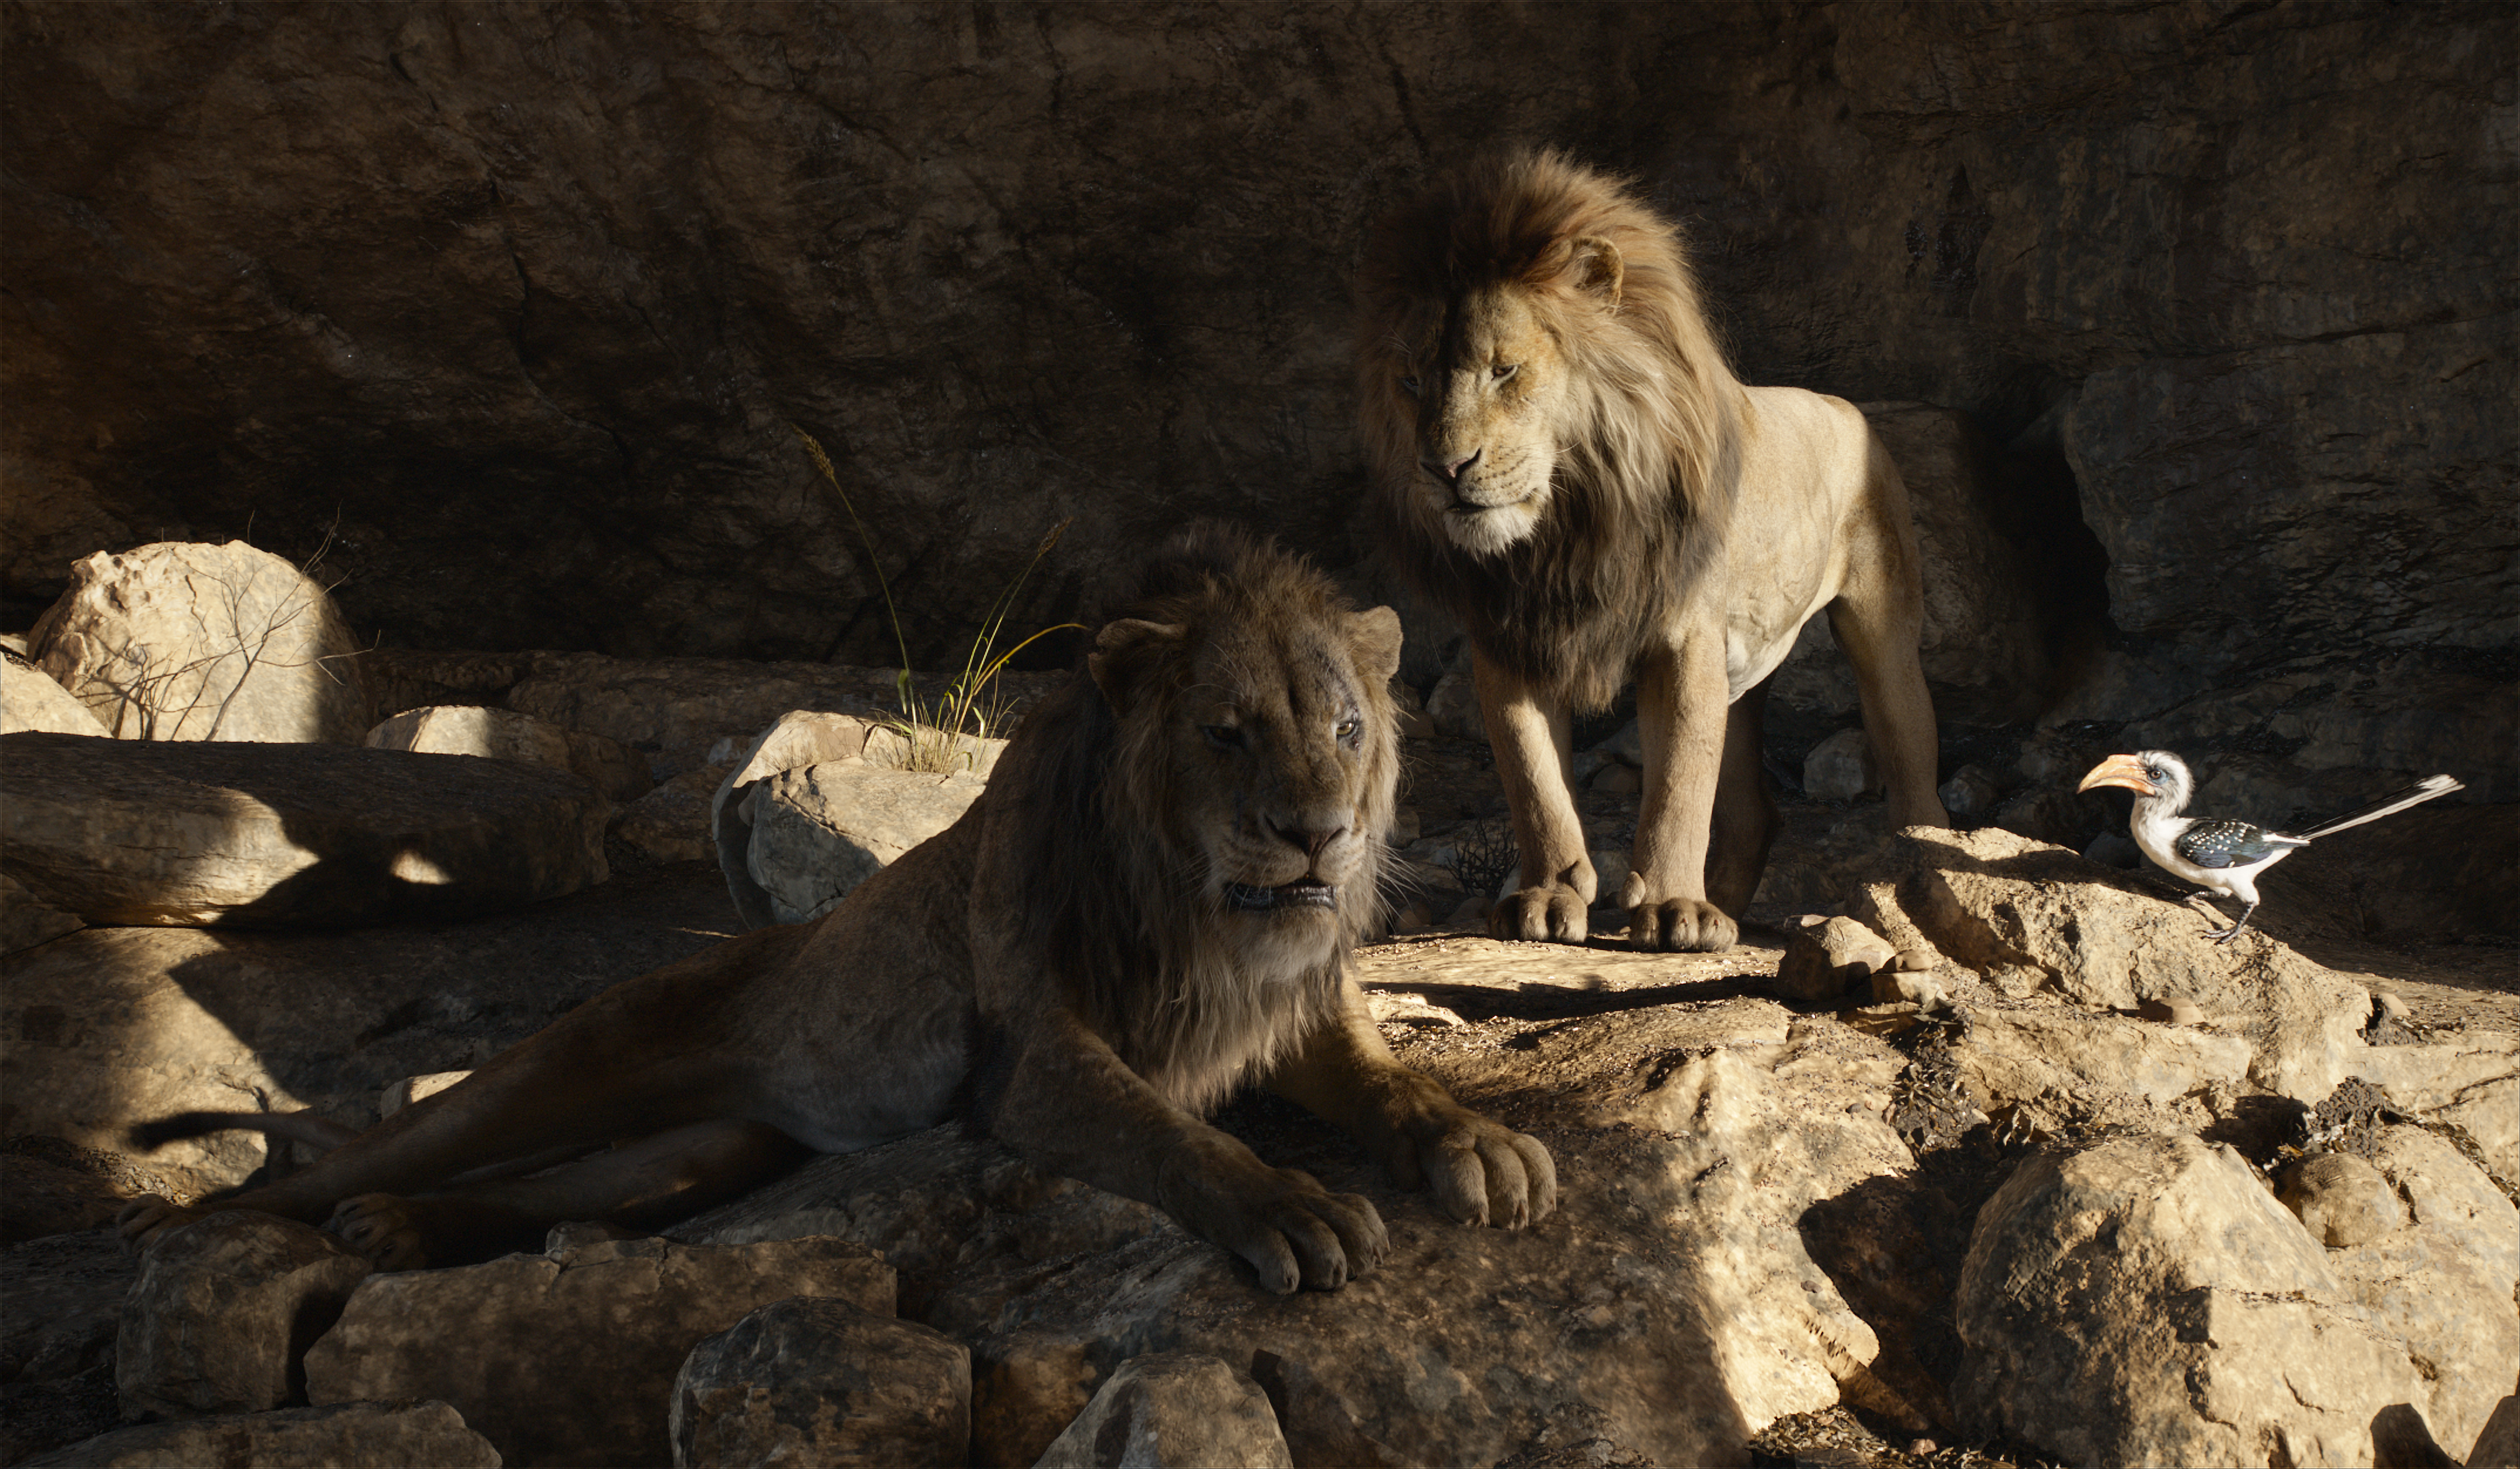 The Lion King 2019 4k Ultra Hd Wallpaper Background